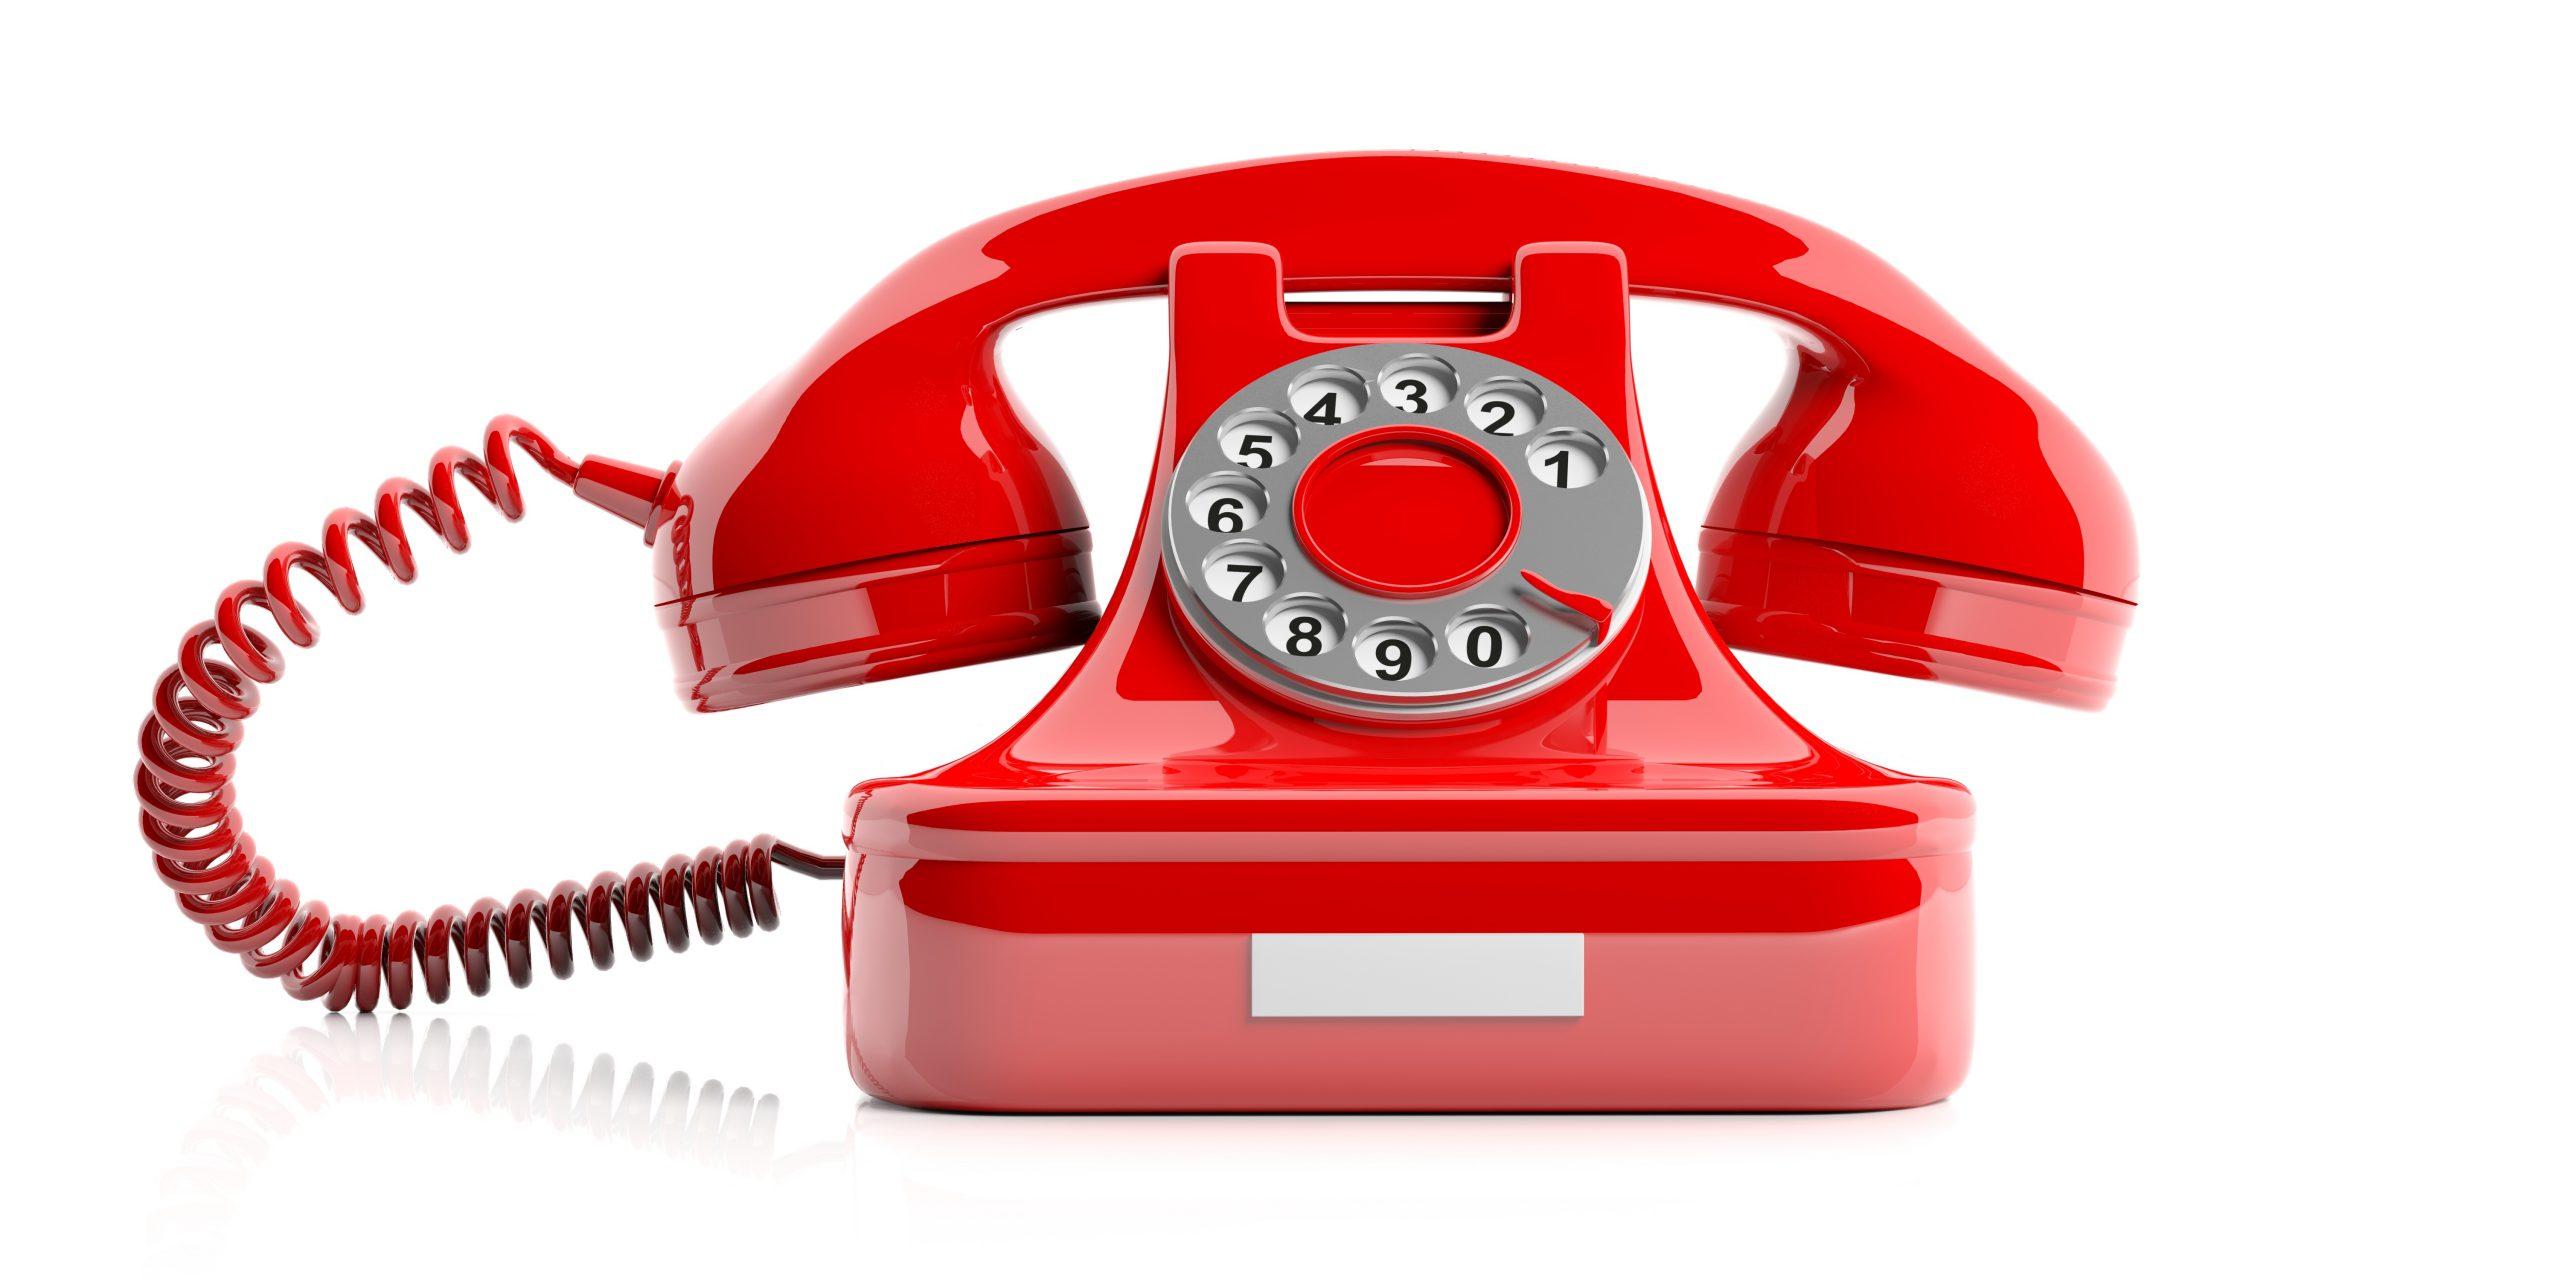 Contacto-AUno-Teléfono-Rojo